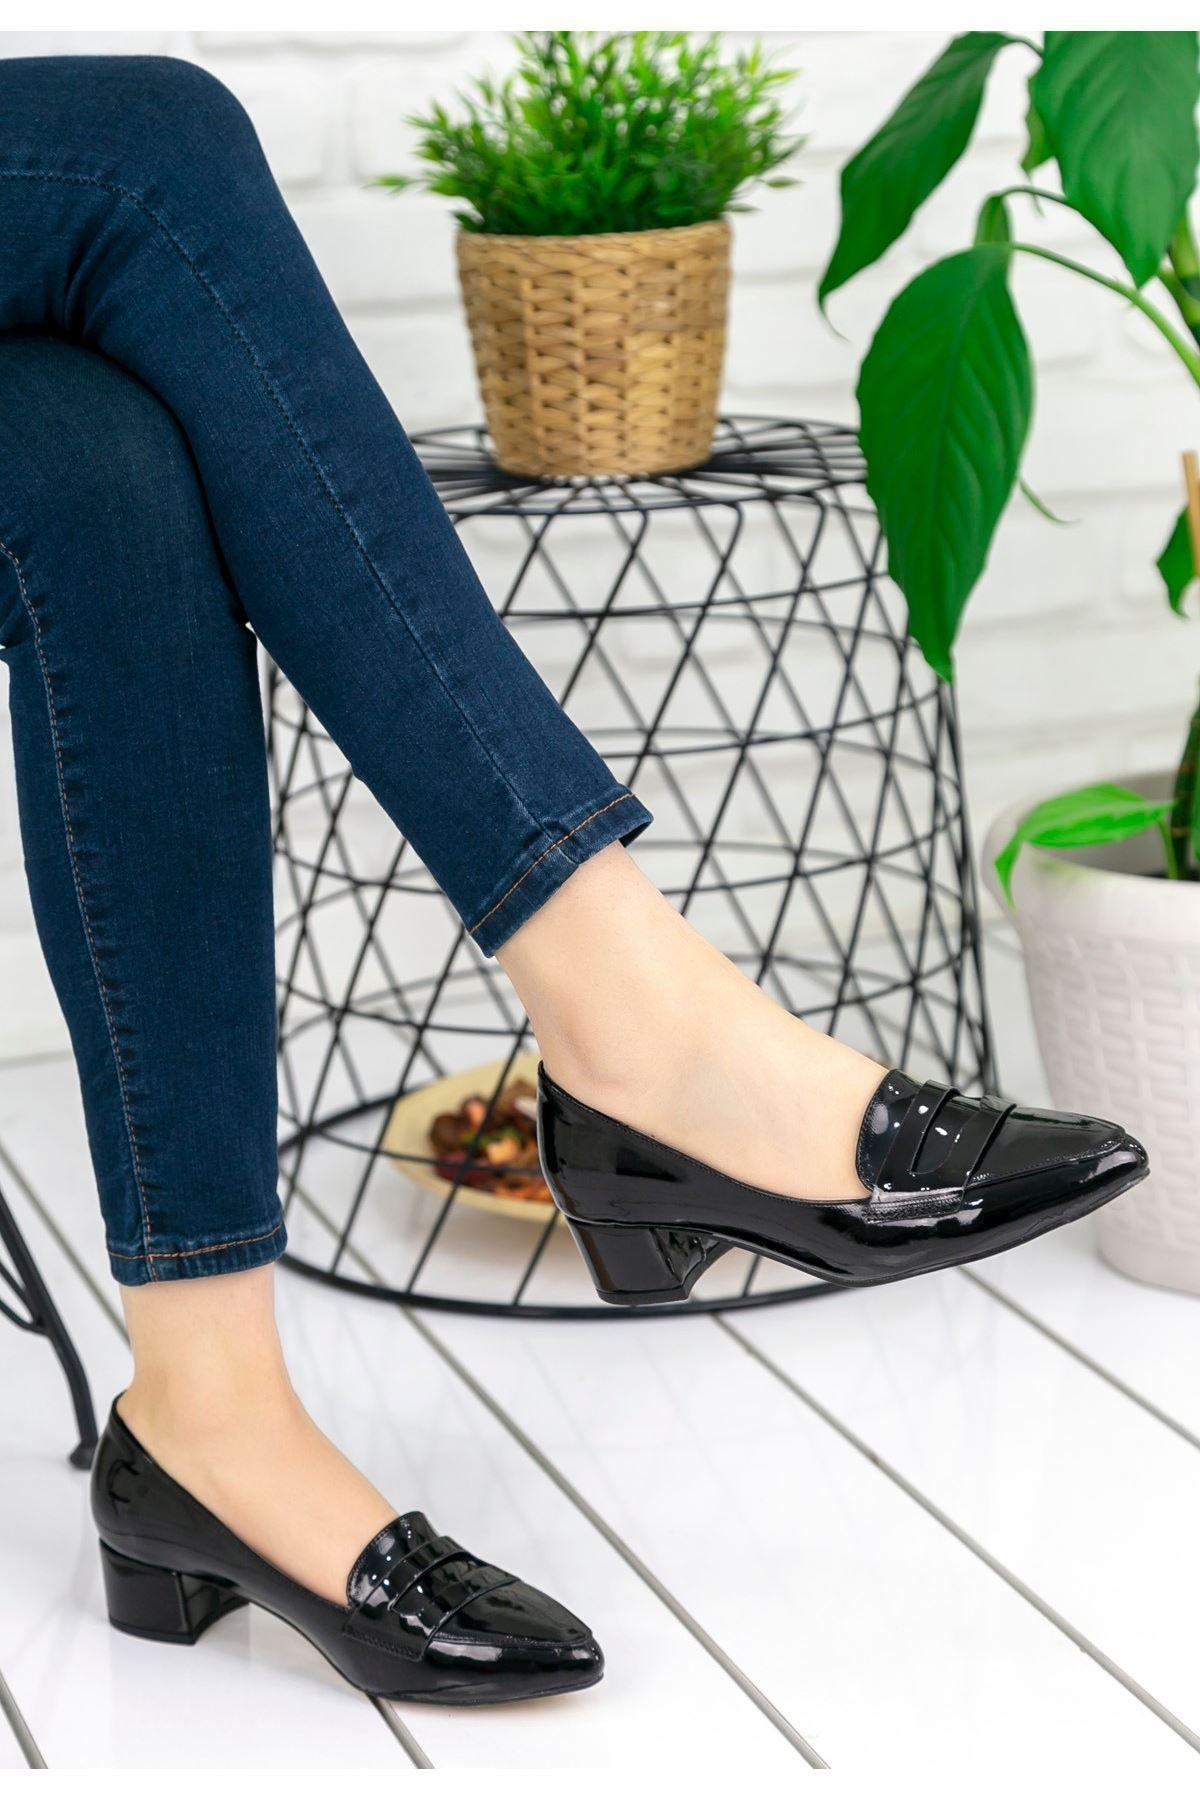 Reyna Siyah Rugan Topuklu Ayakkabı